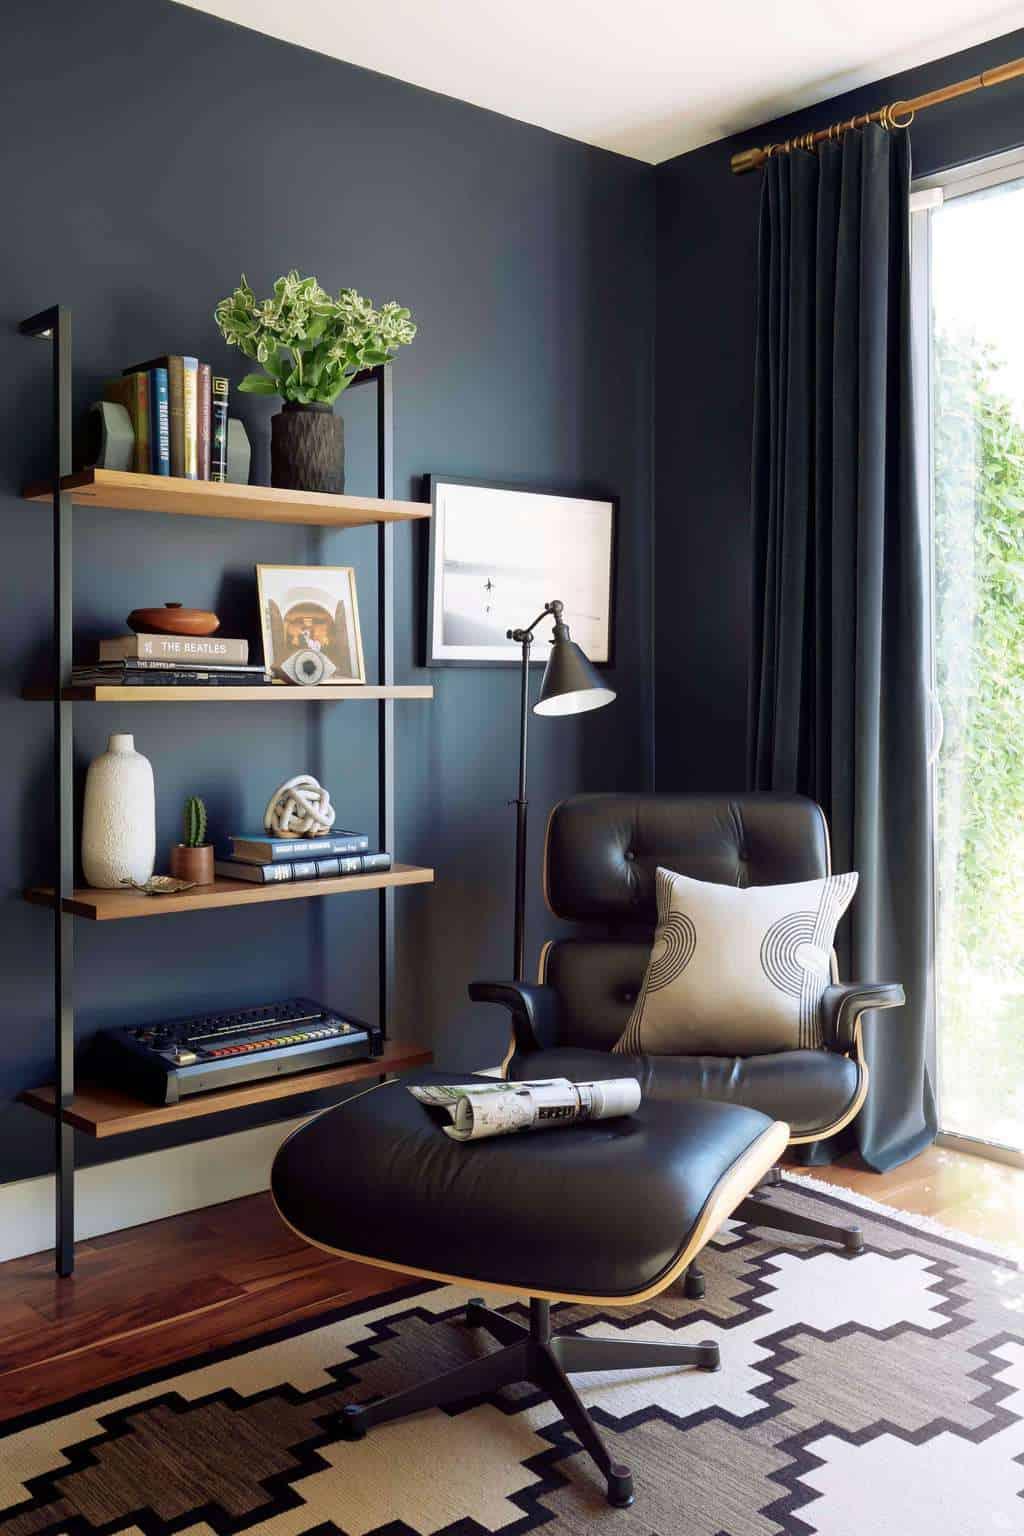 5 Cosy modern decor living room ideas to inspire you - Tammymum